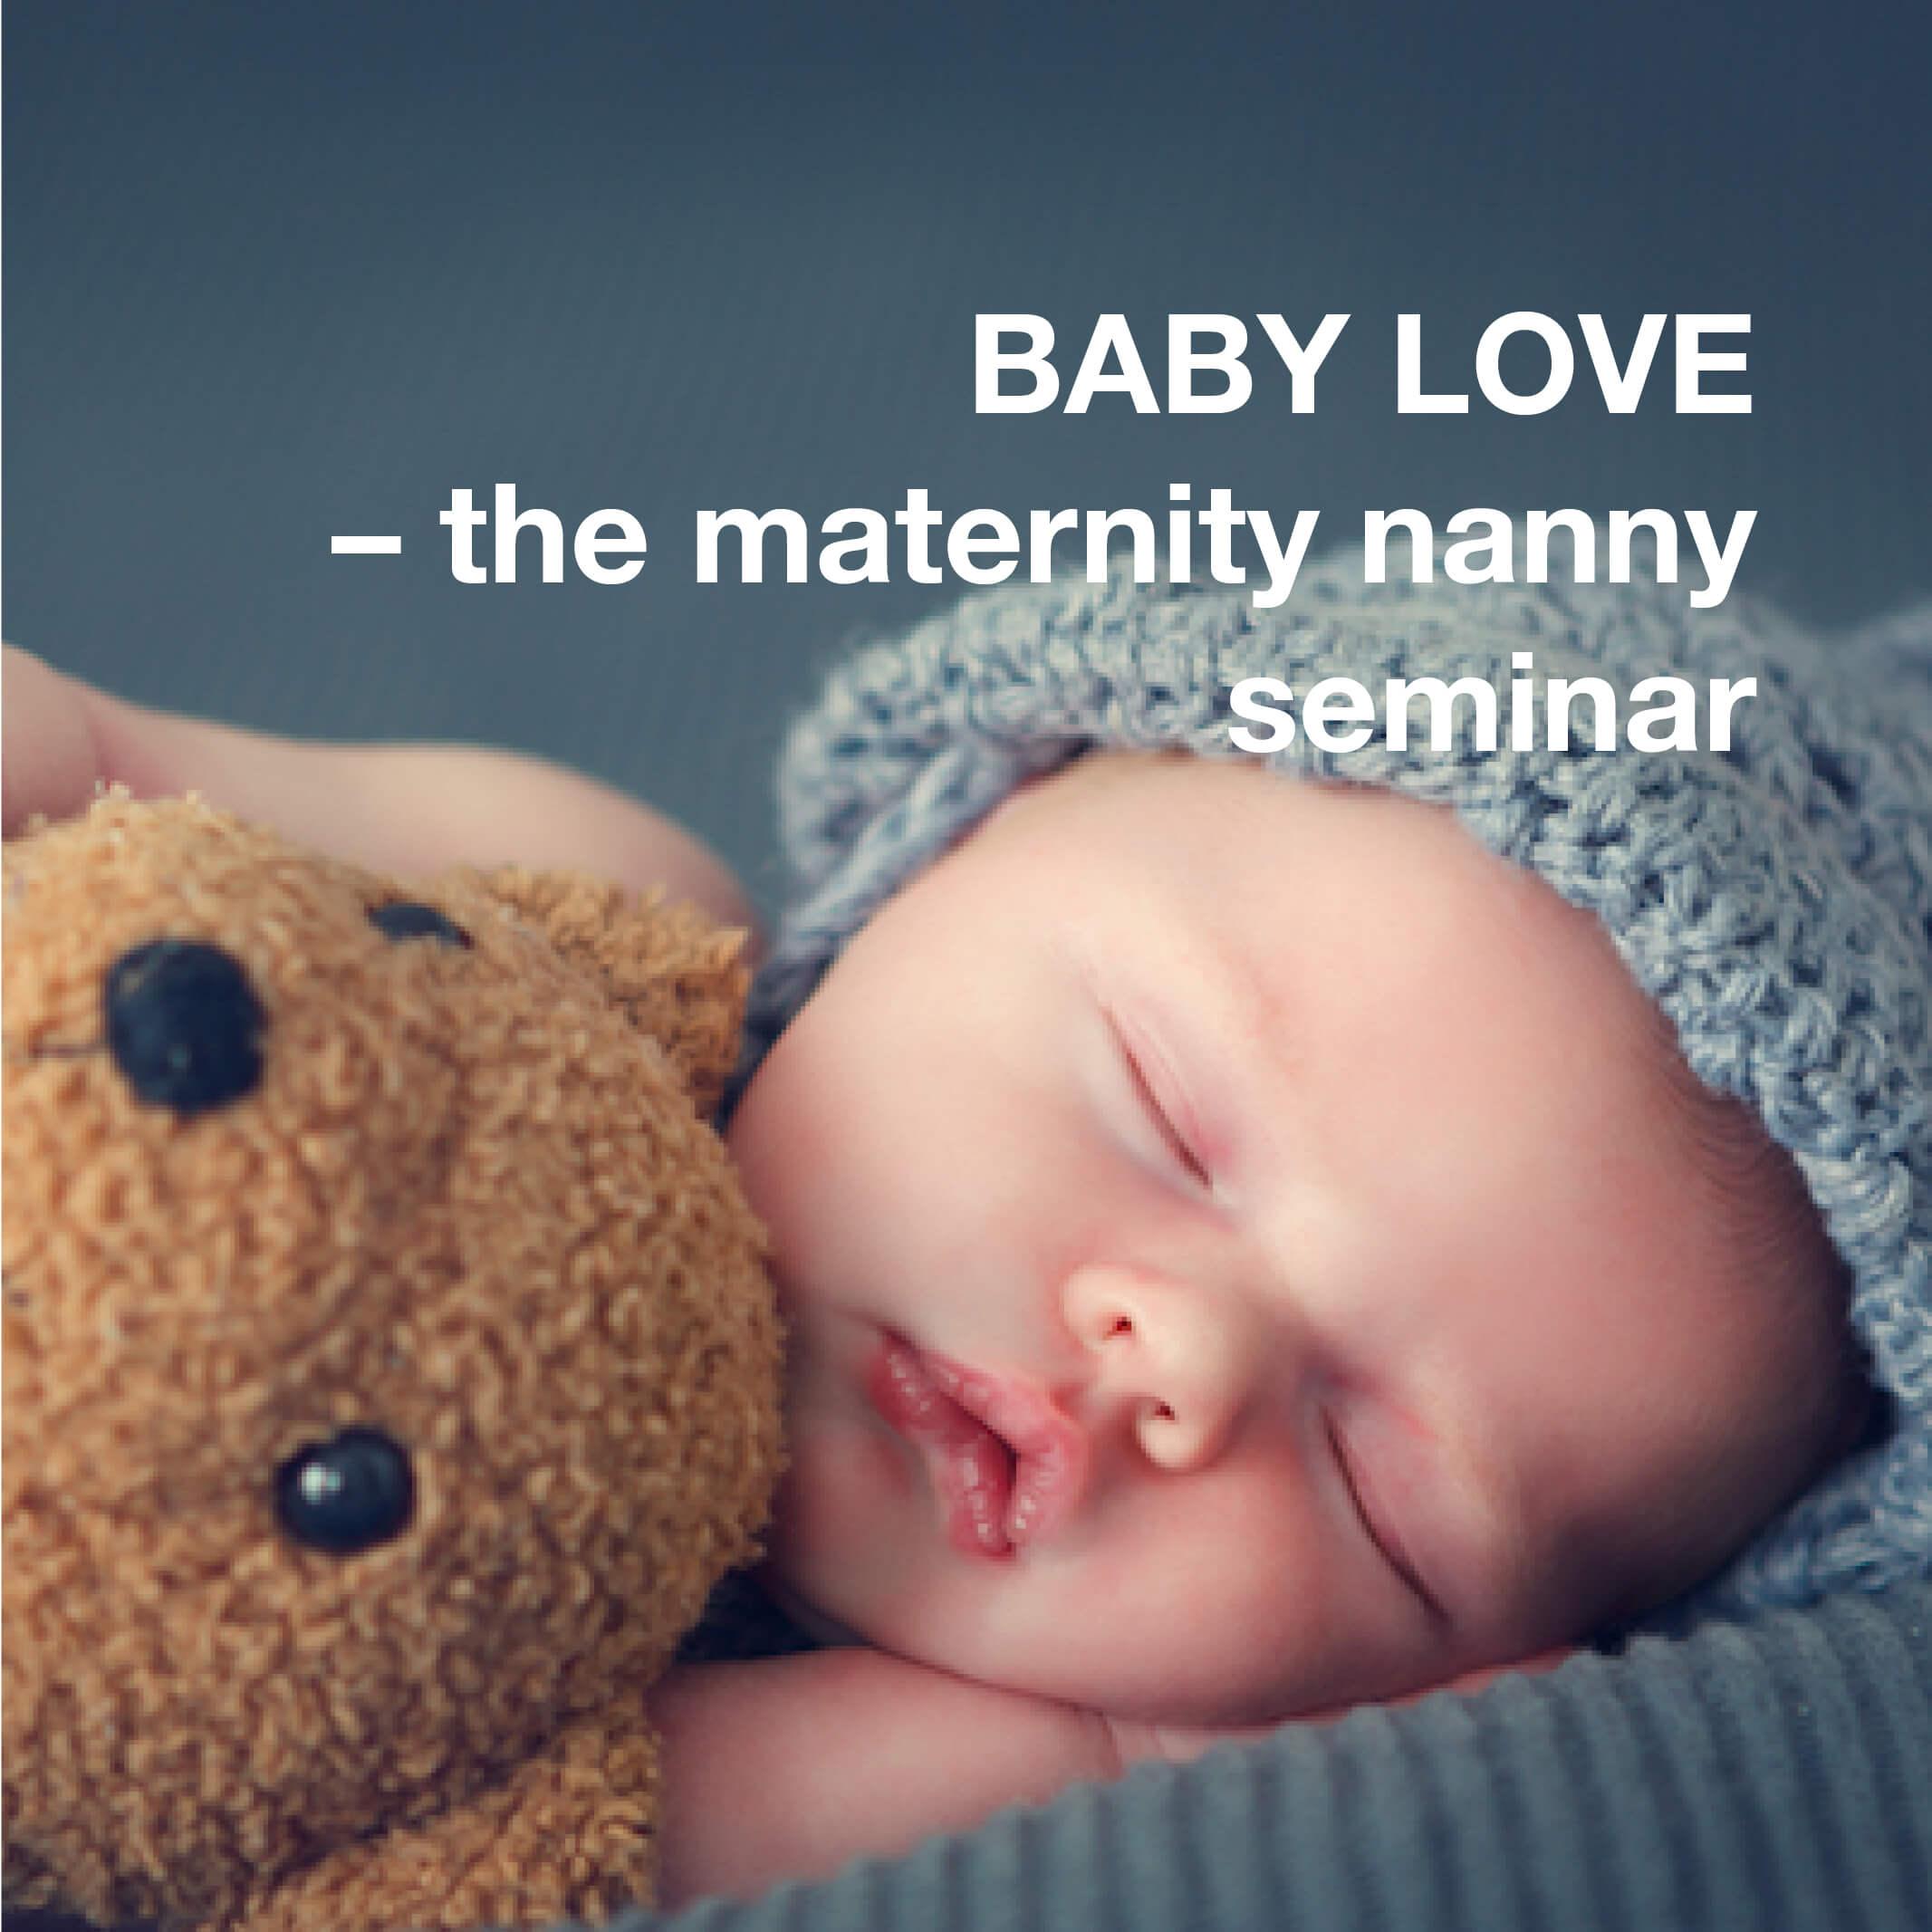 Seminar maternity nurses in private households